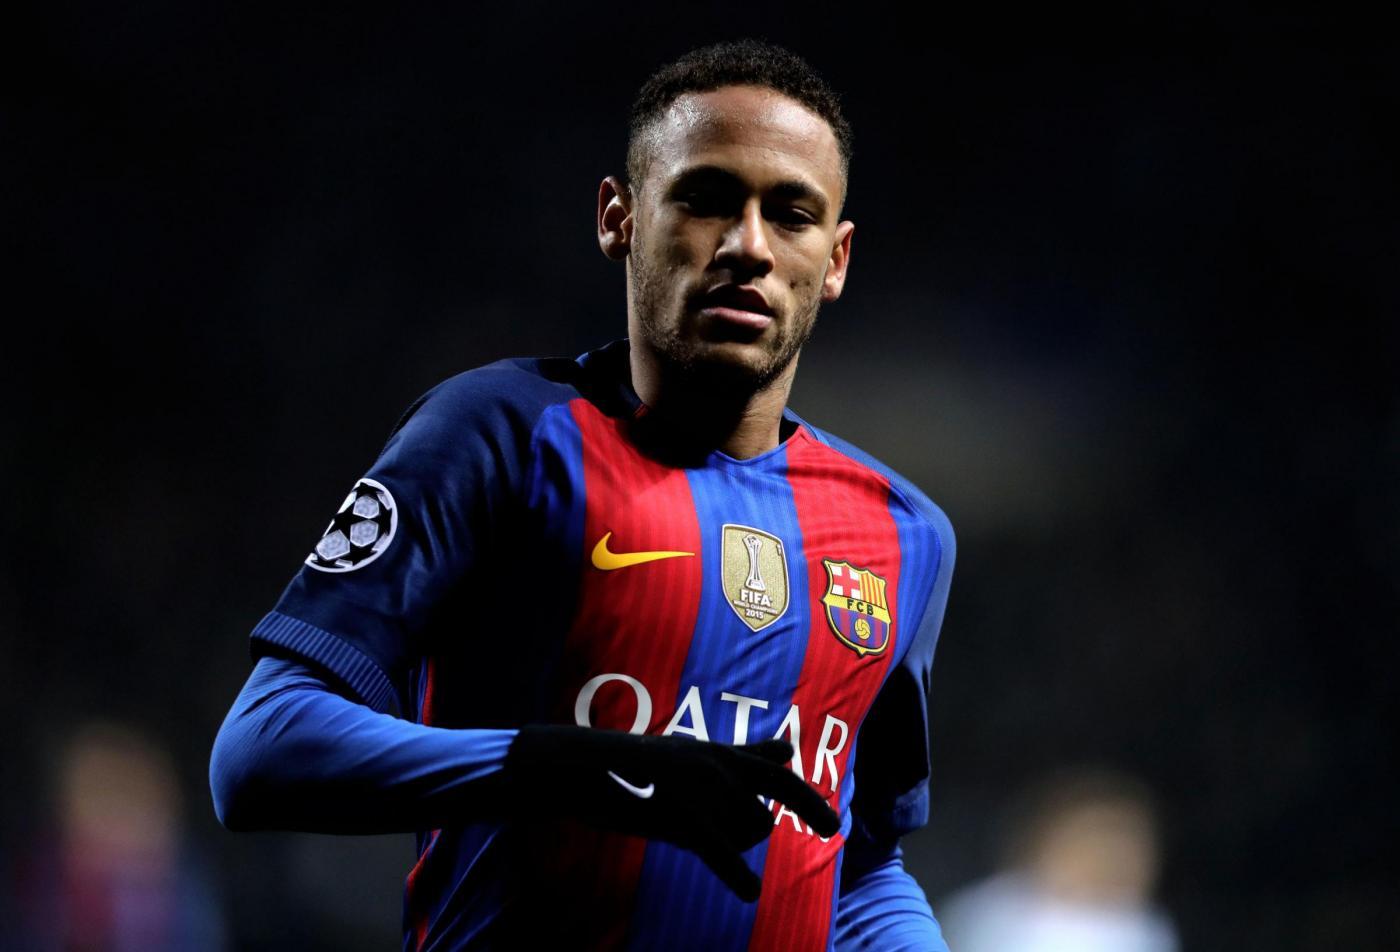 Neymar Juventus: Verratti